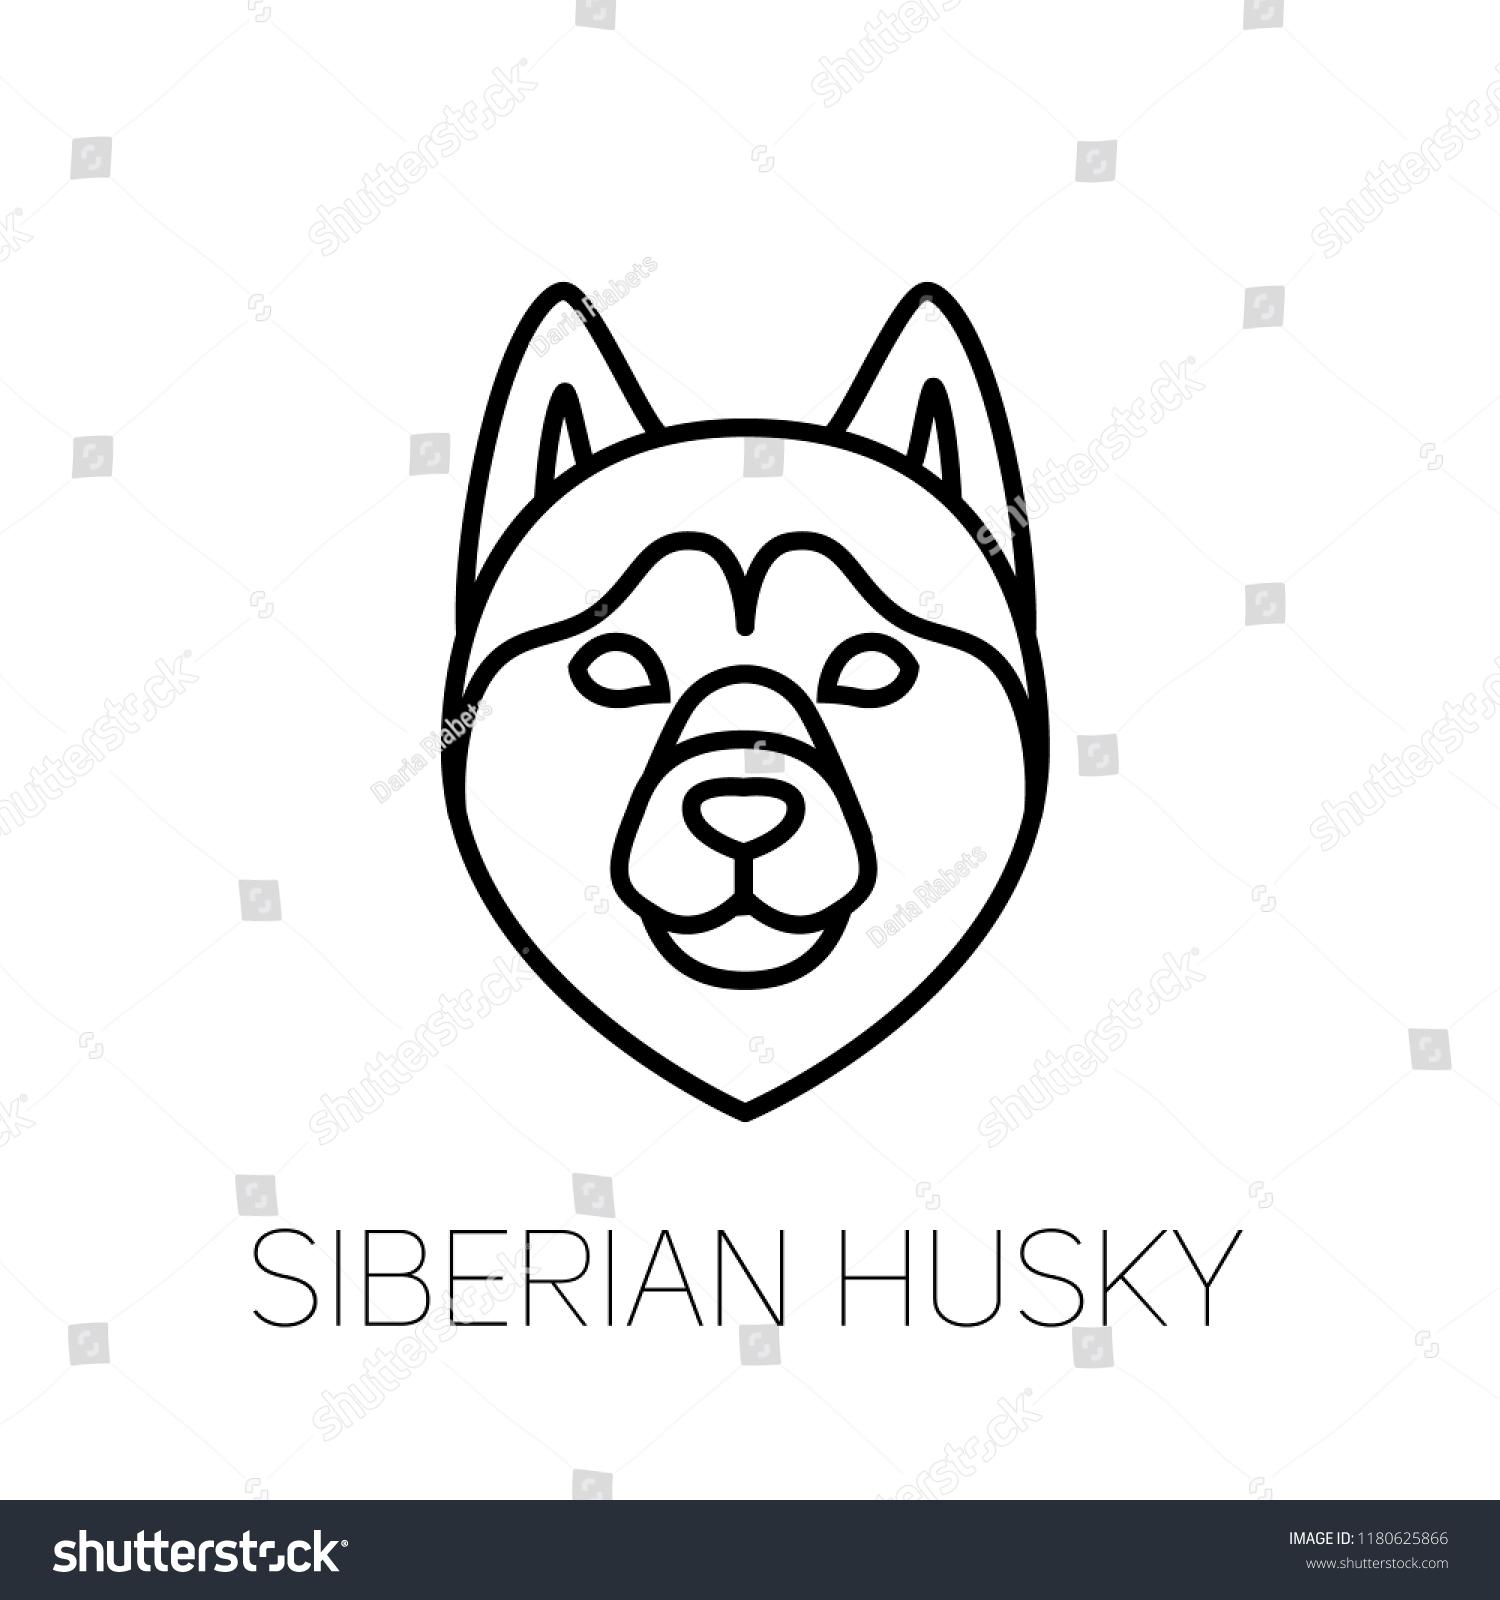 Siberian Husky Linear Face Icon Isolated Stock Vector Royalty Free